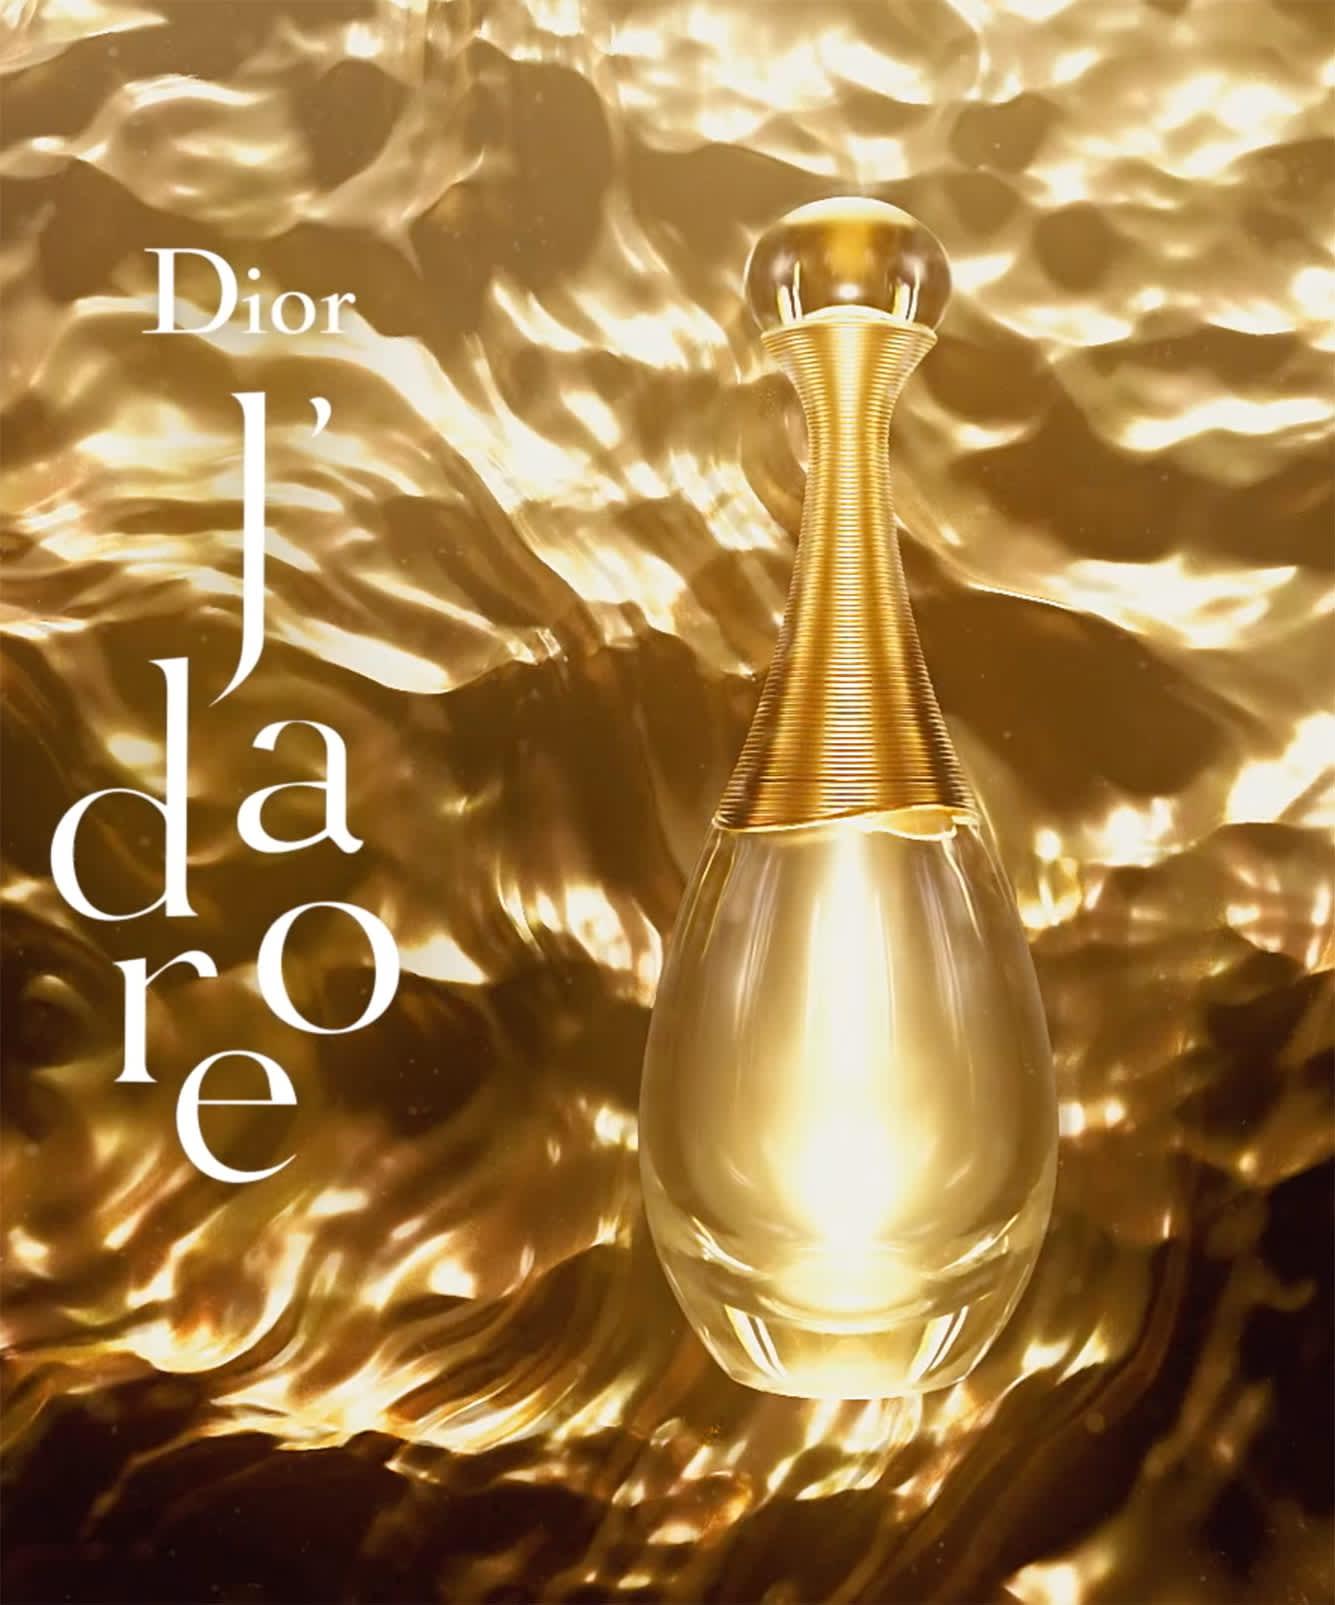 Dior - j'adore - Romain Gavras -  Kouhei Nakama - Motion design - Perfume